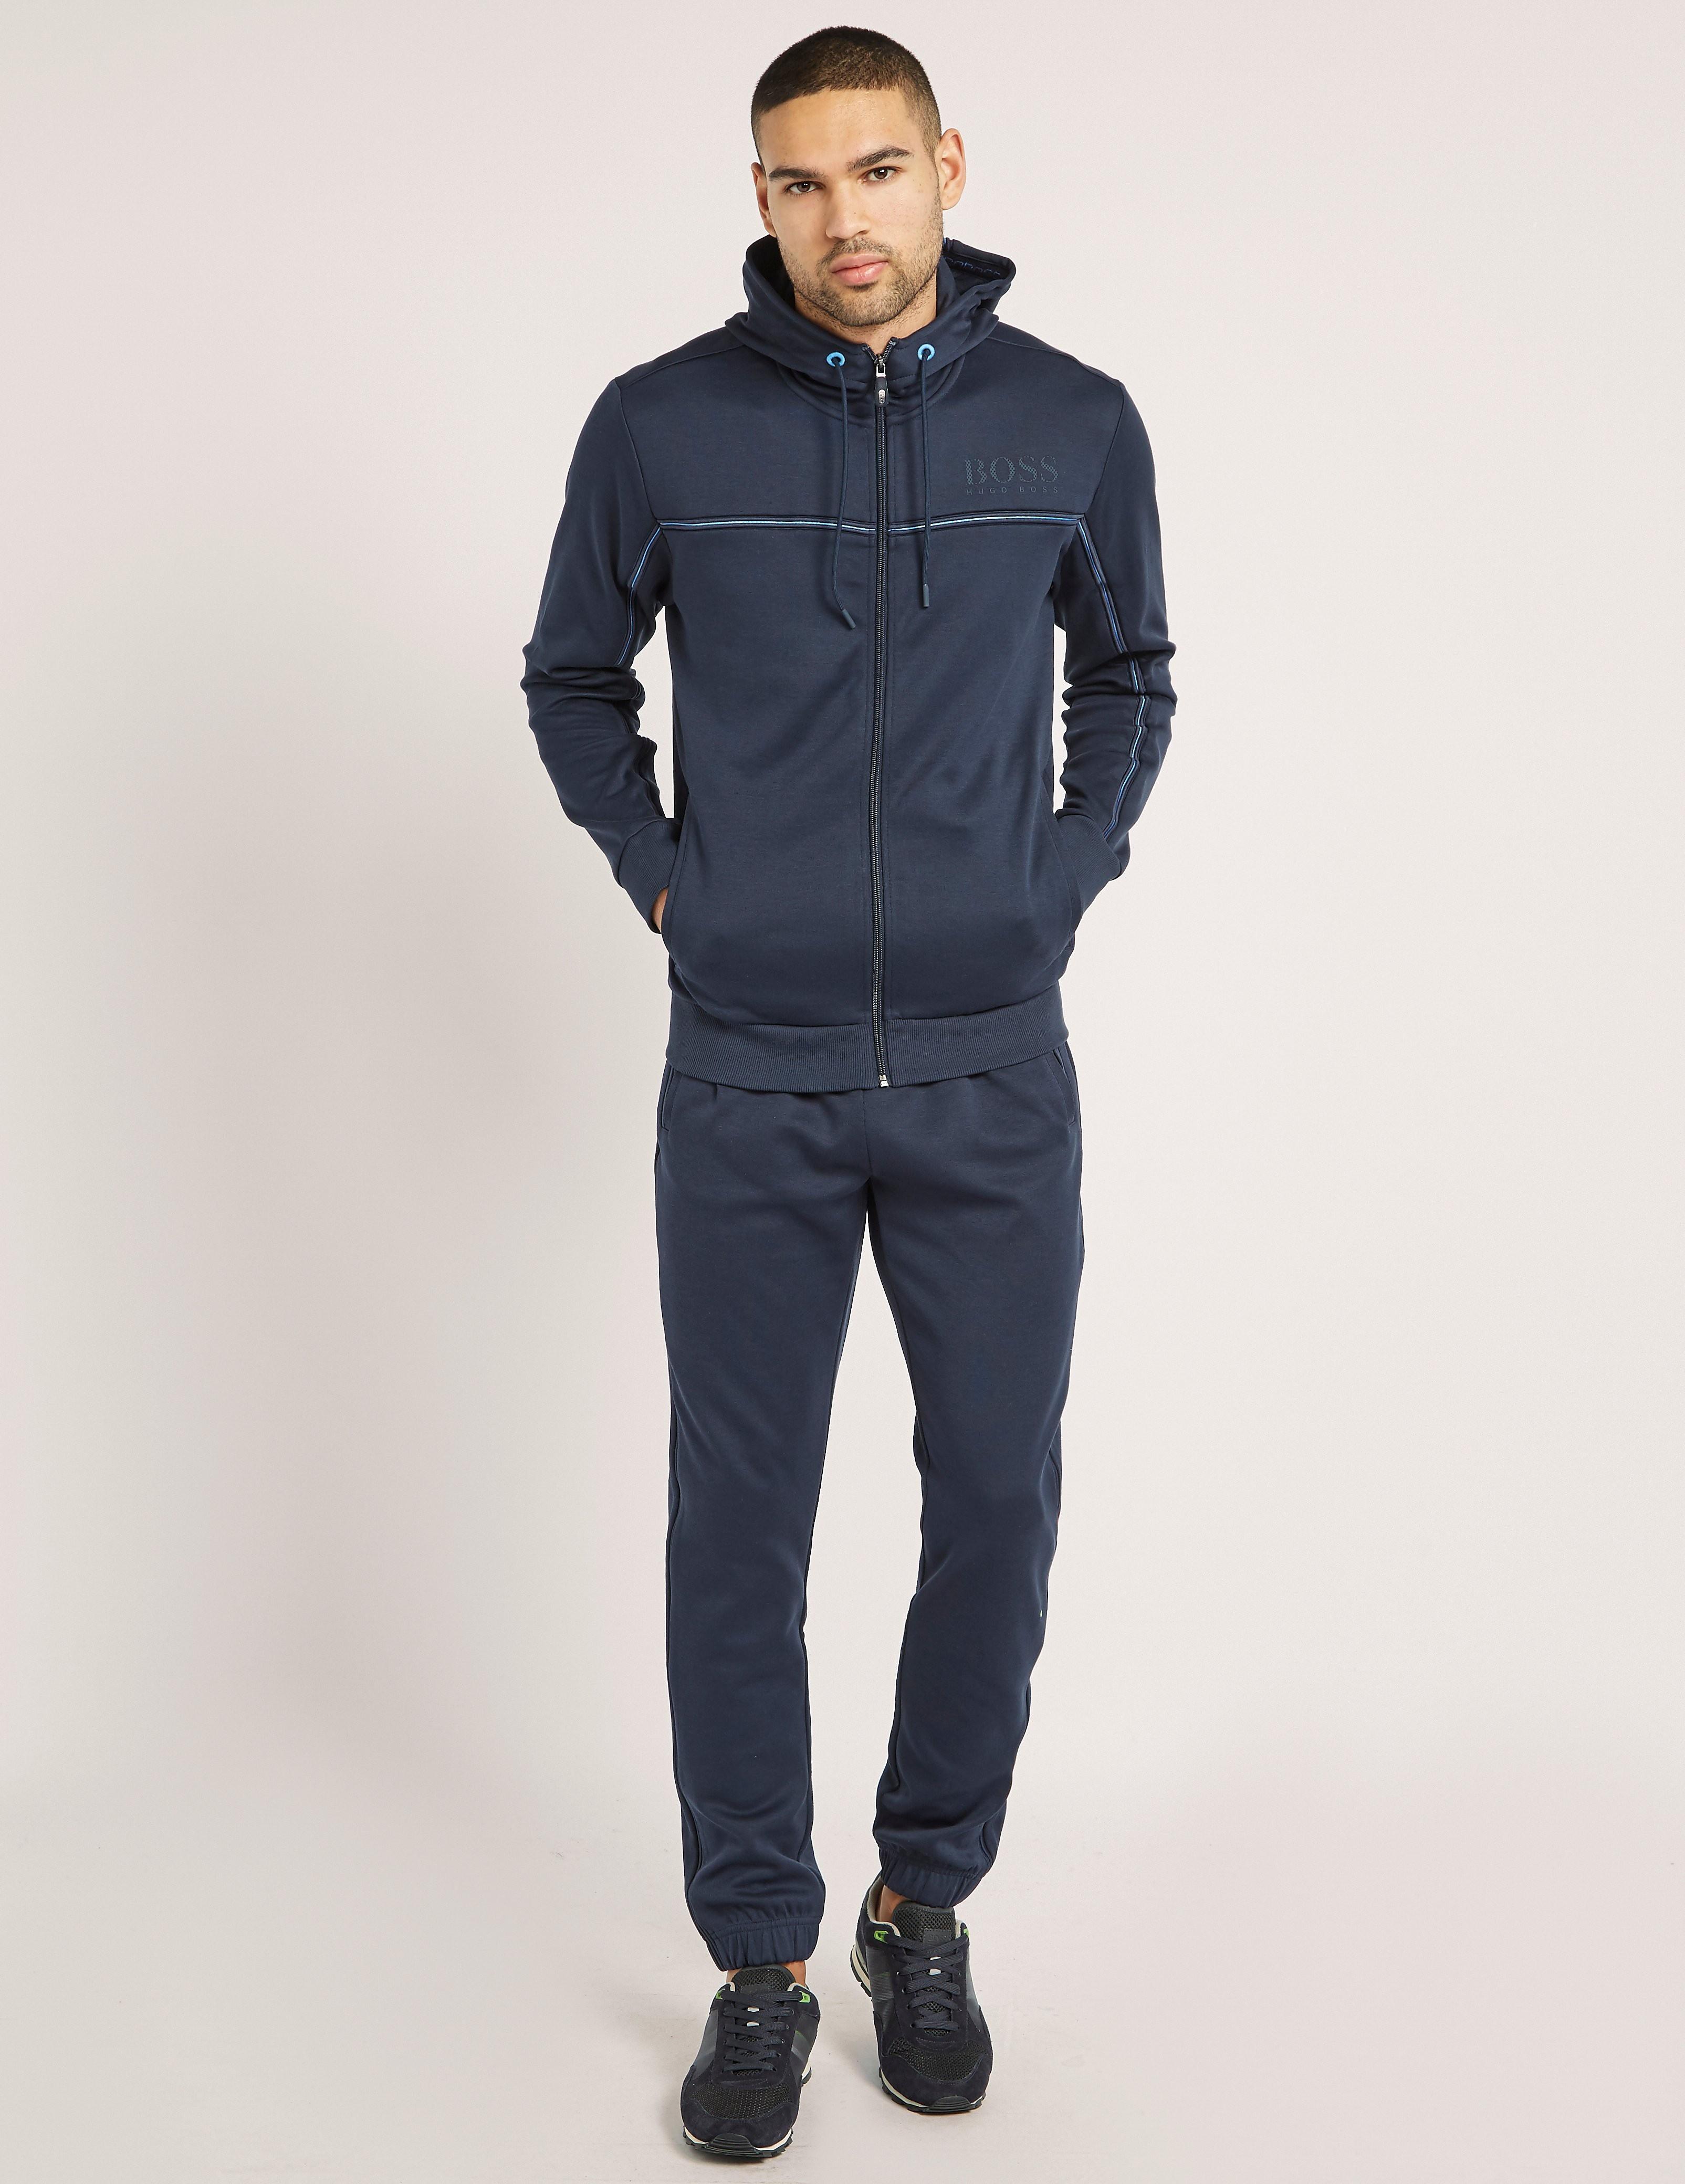 BOSS Saggy Hooded Sweatshirt